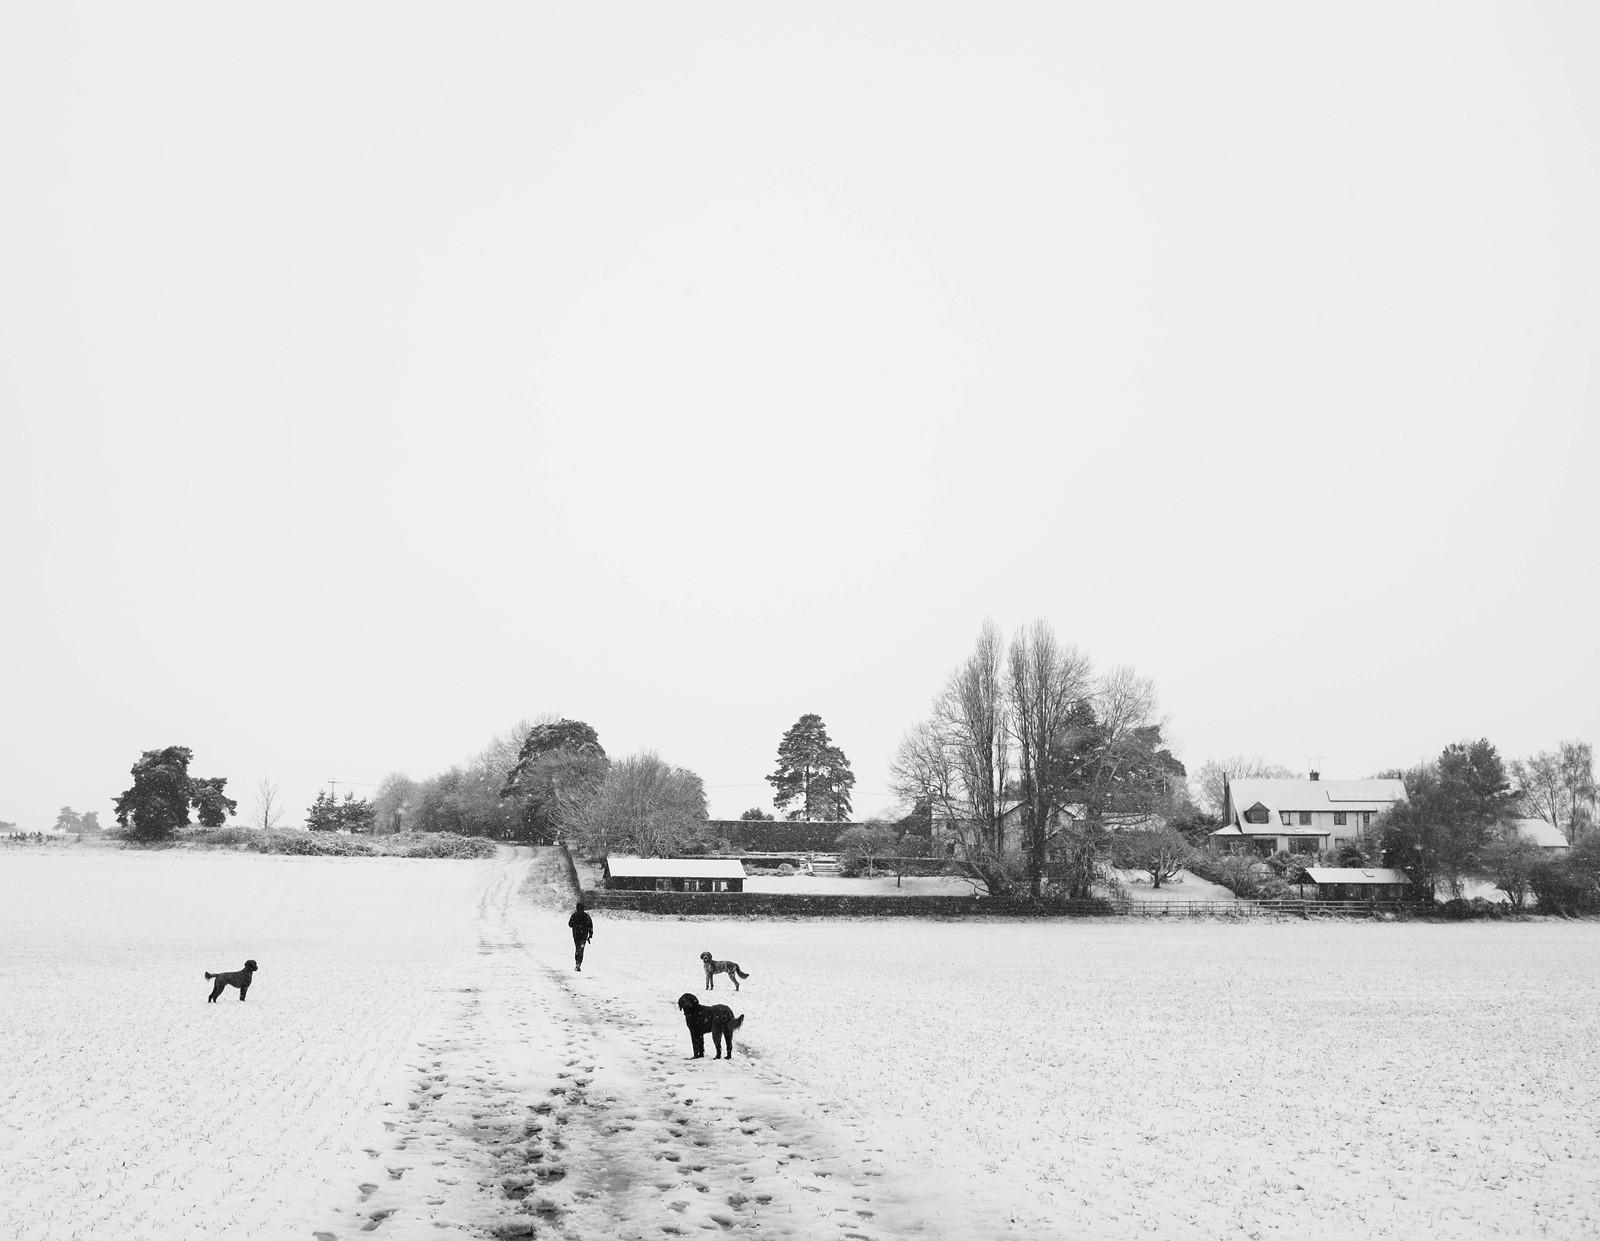 December Snow 2017